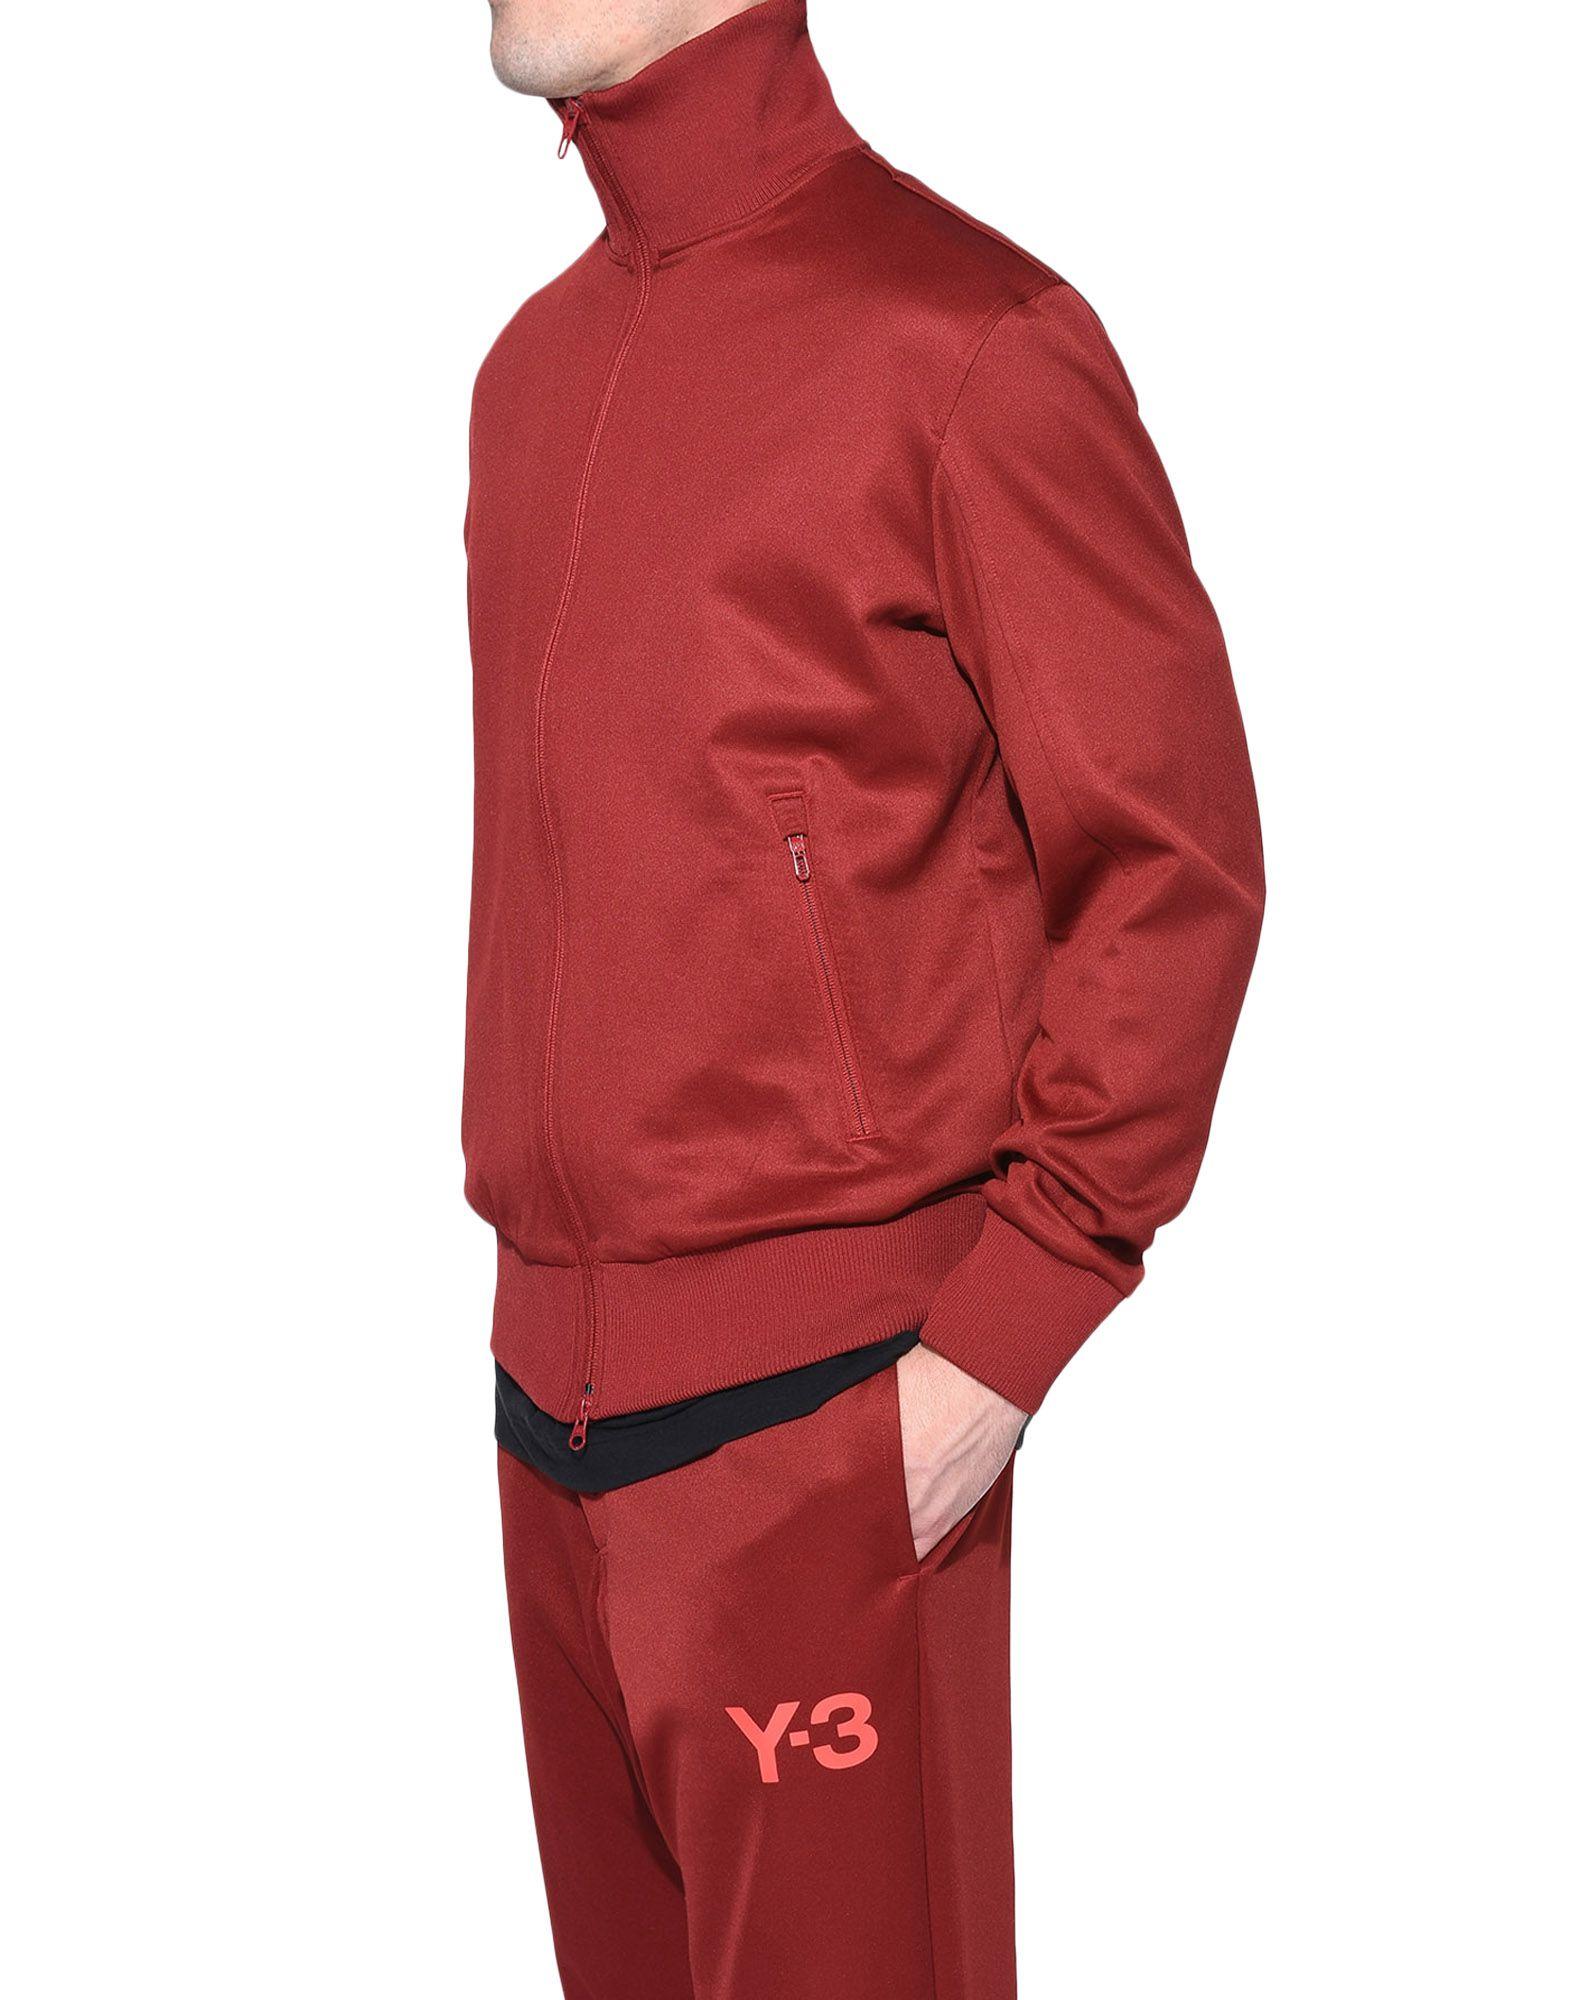 Y-3 Y-3 Classic Track Jacket Track top Man e